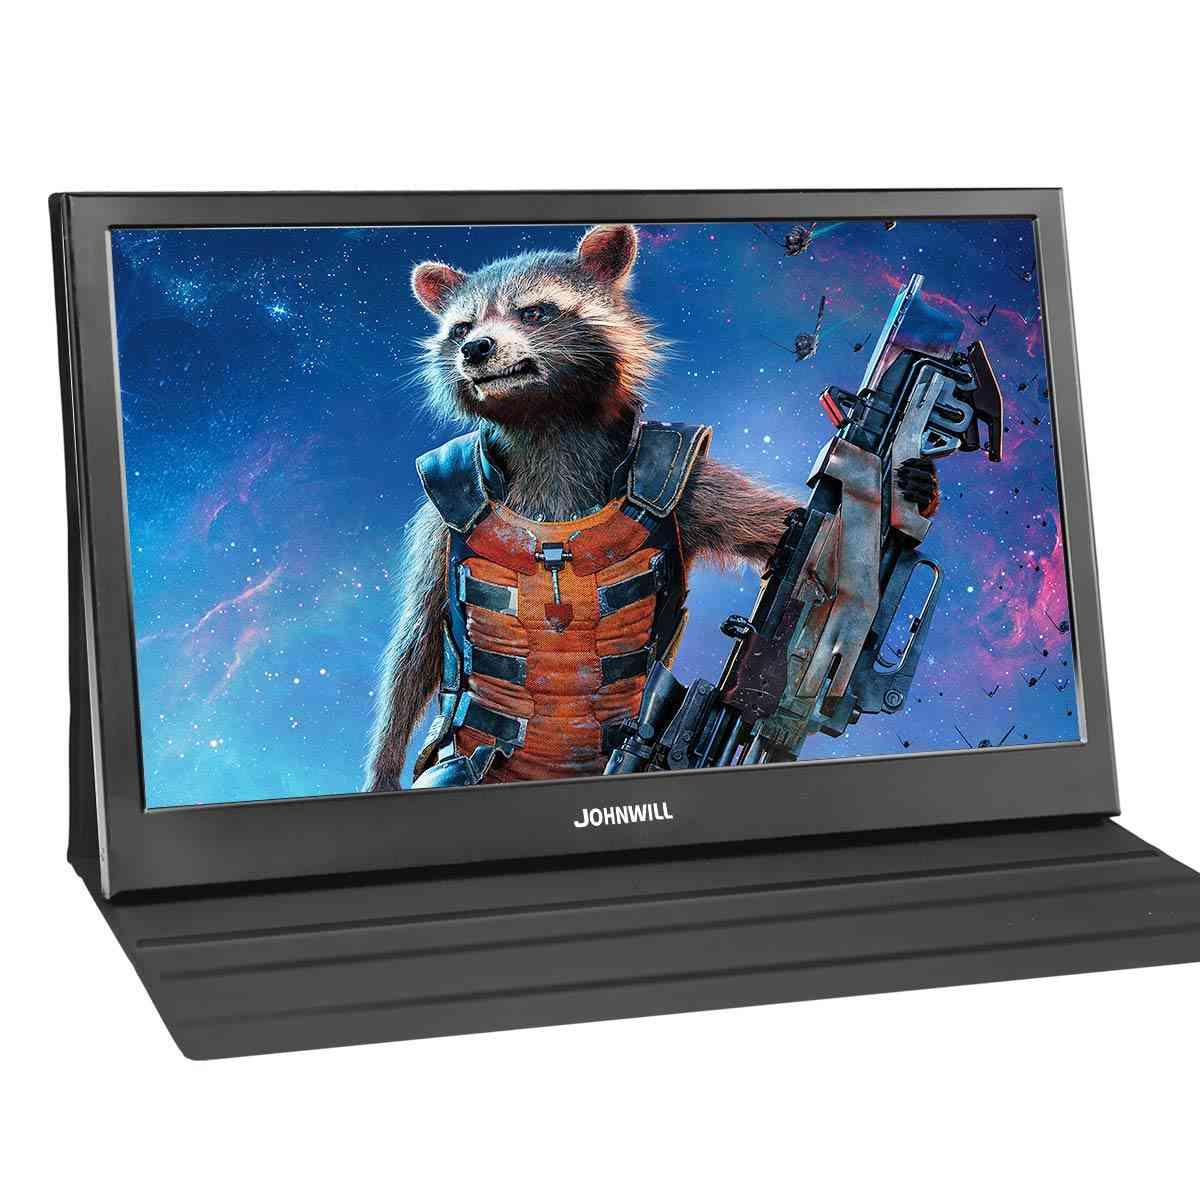 Portable Gaming Monitor, 2k Resolution Ips Qhd Lcd Display